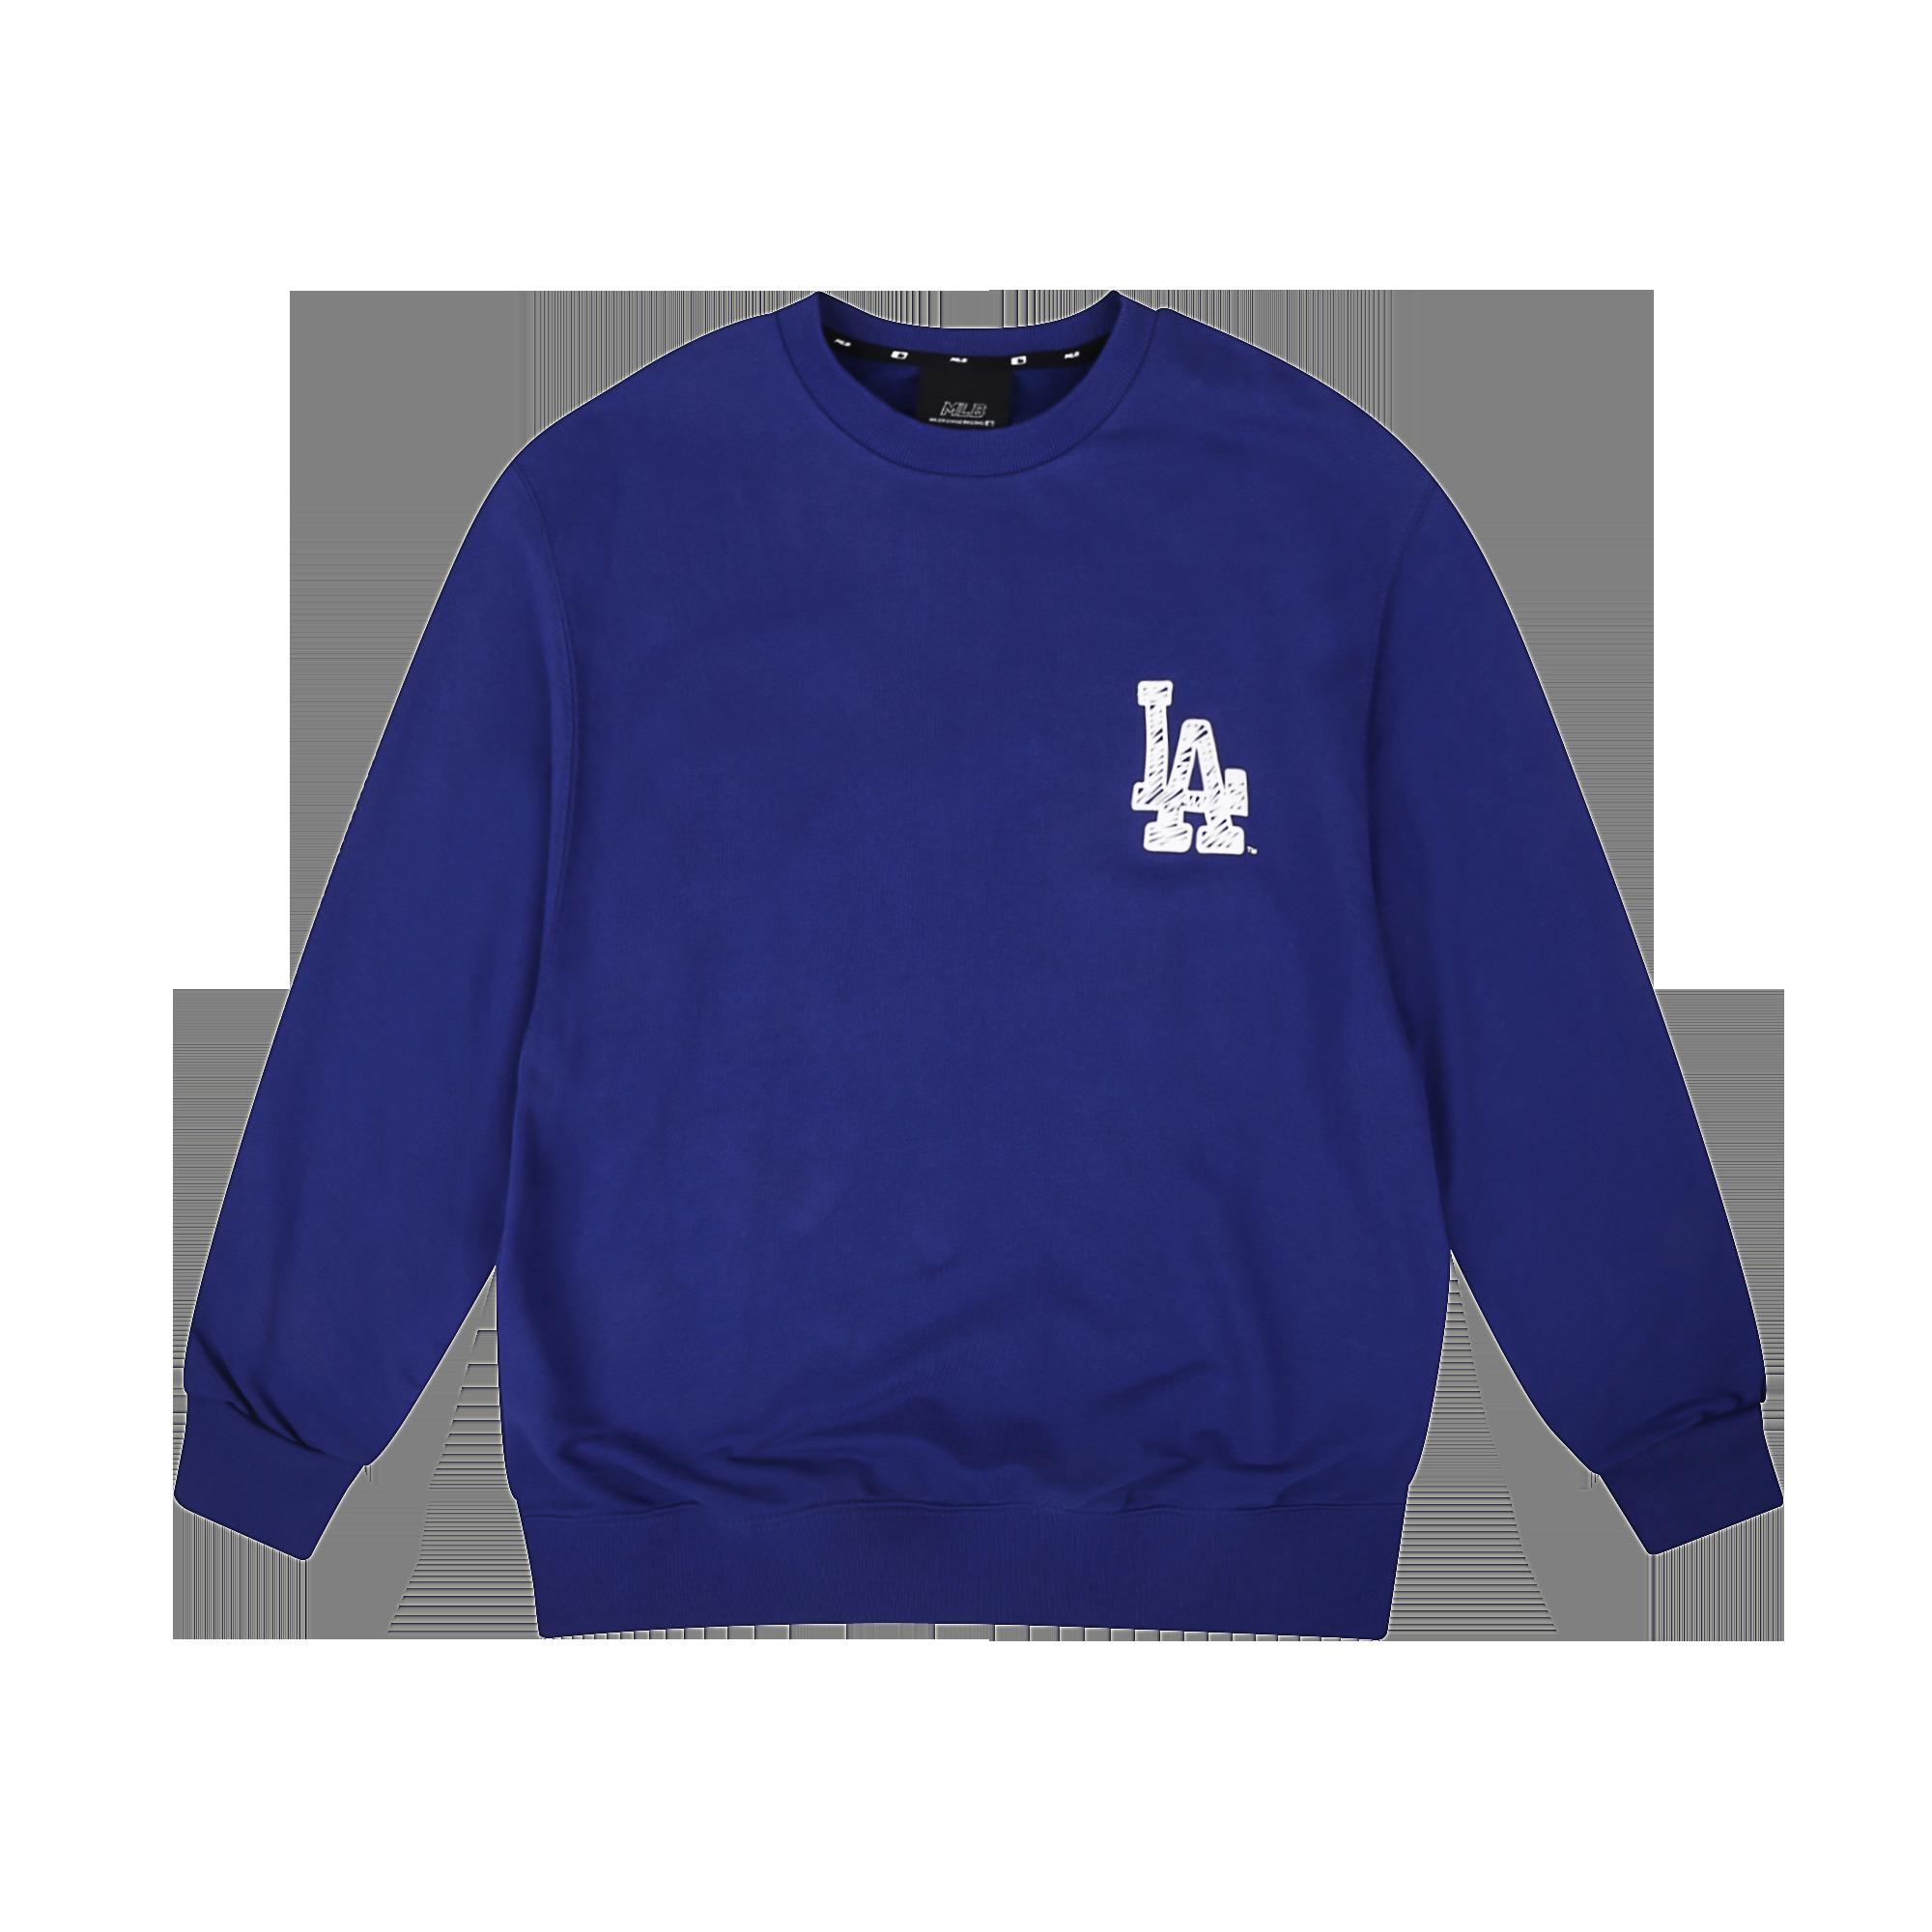 LA다저스 MLBLIKE 오버핏 맨투맨